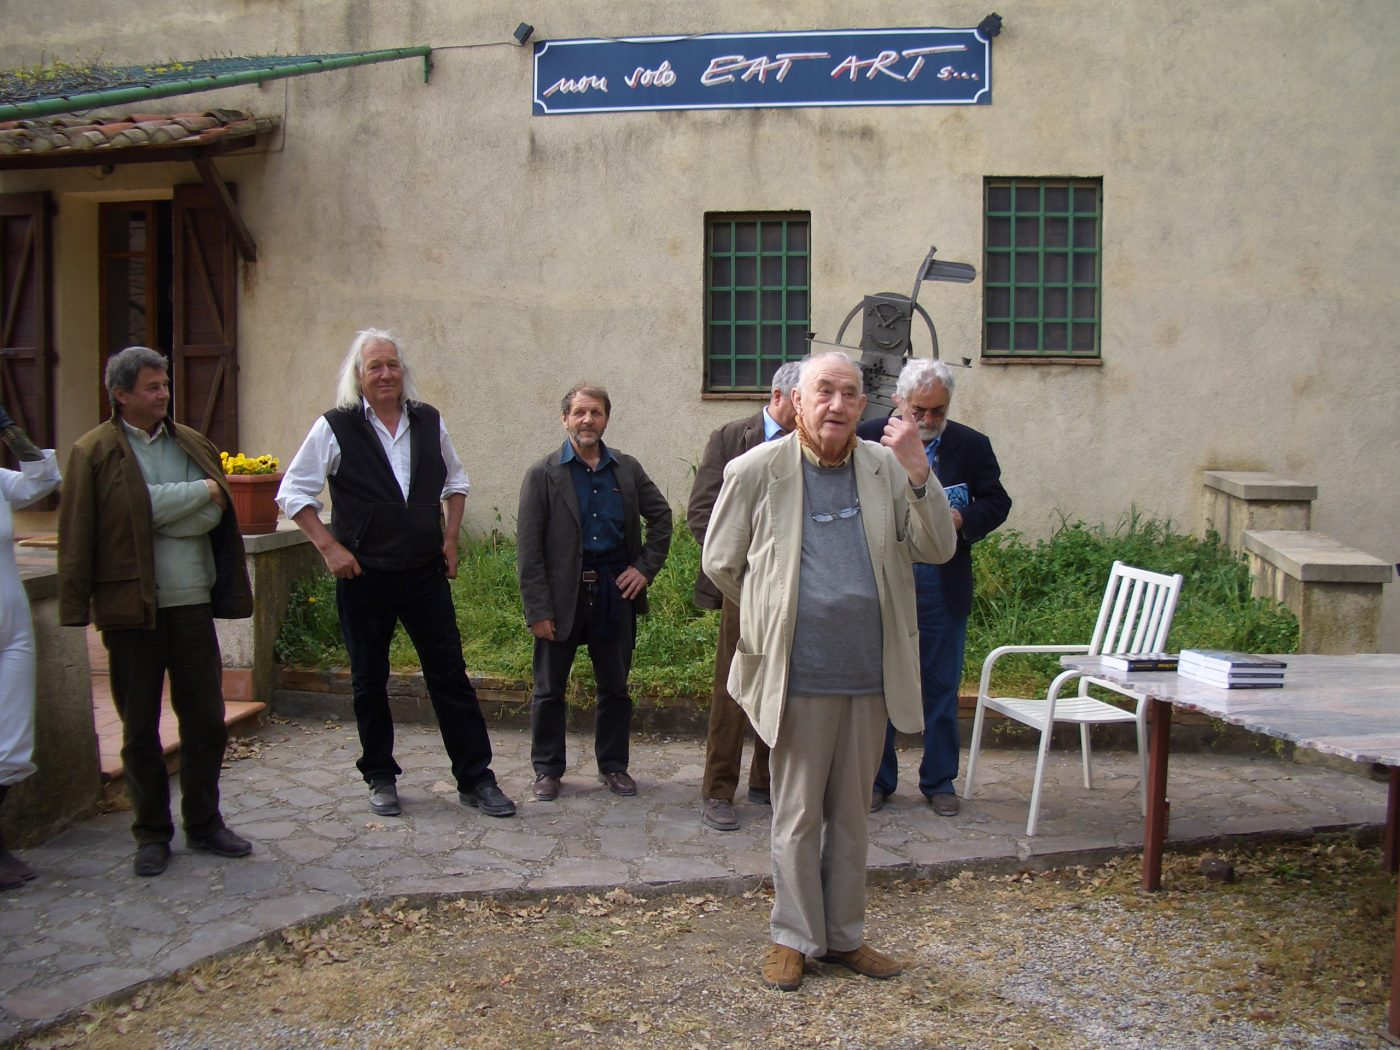 Openings at the Giardino di Daniel Spoerri, Italy